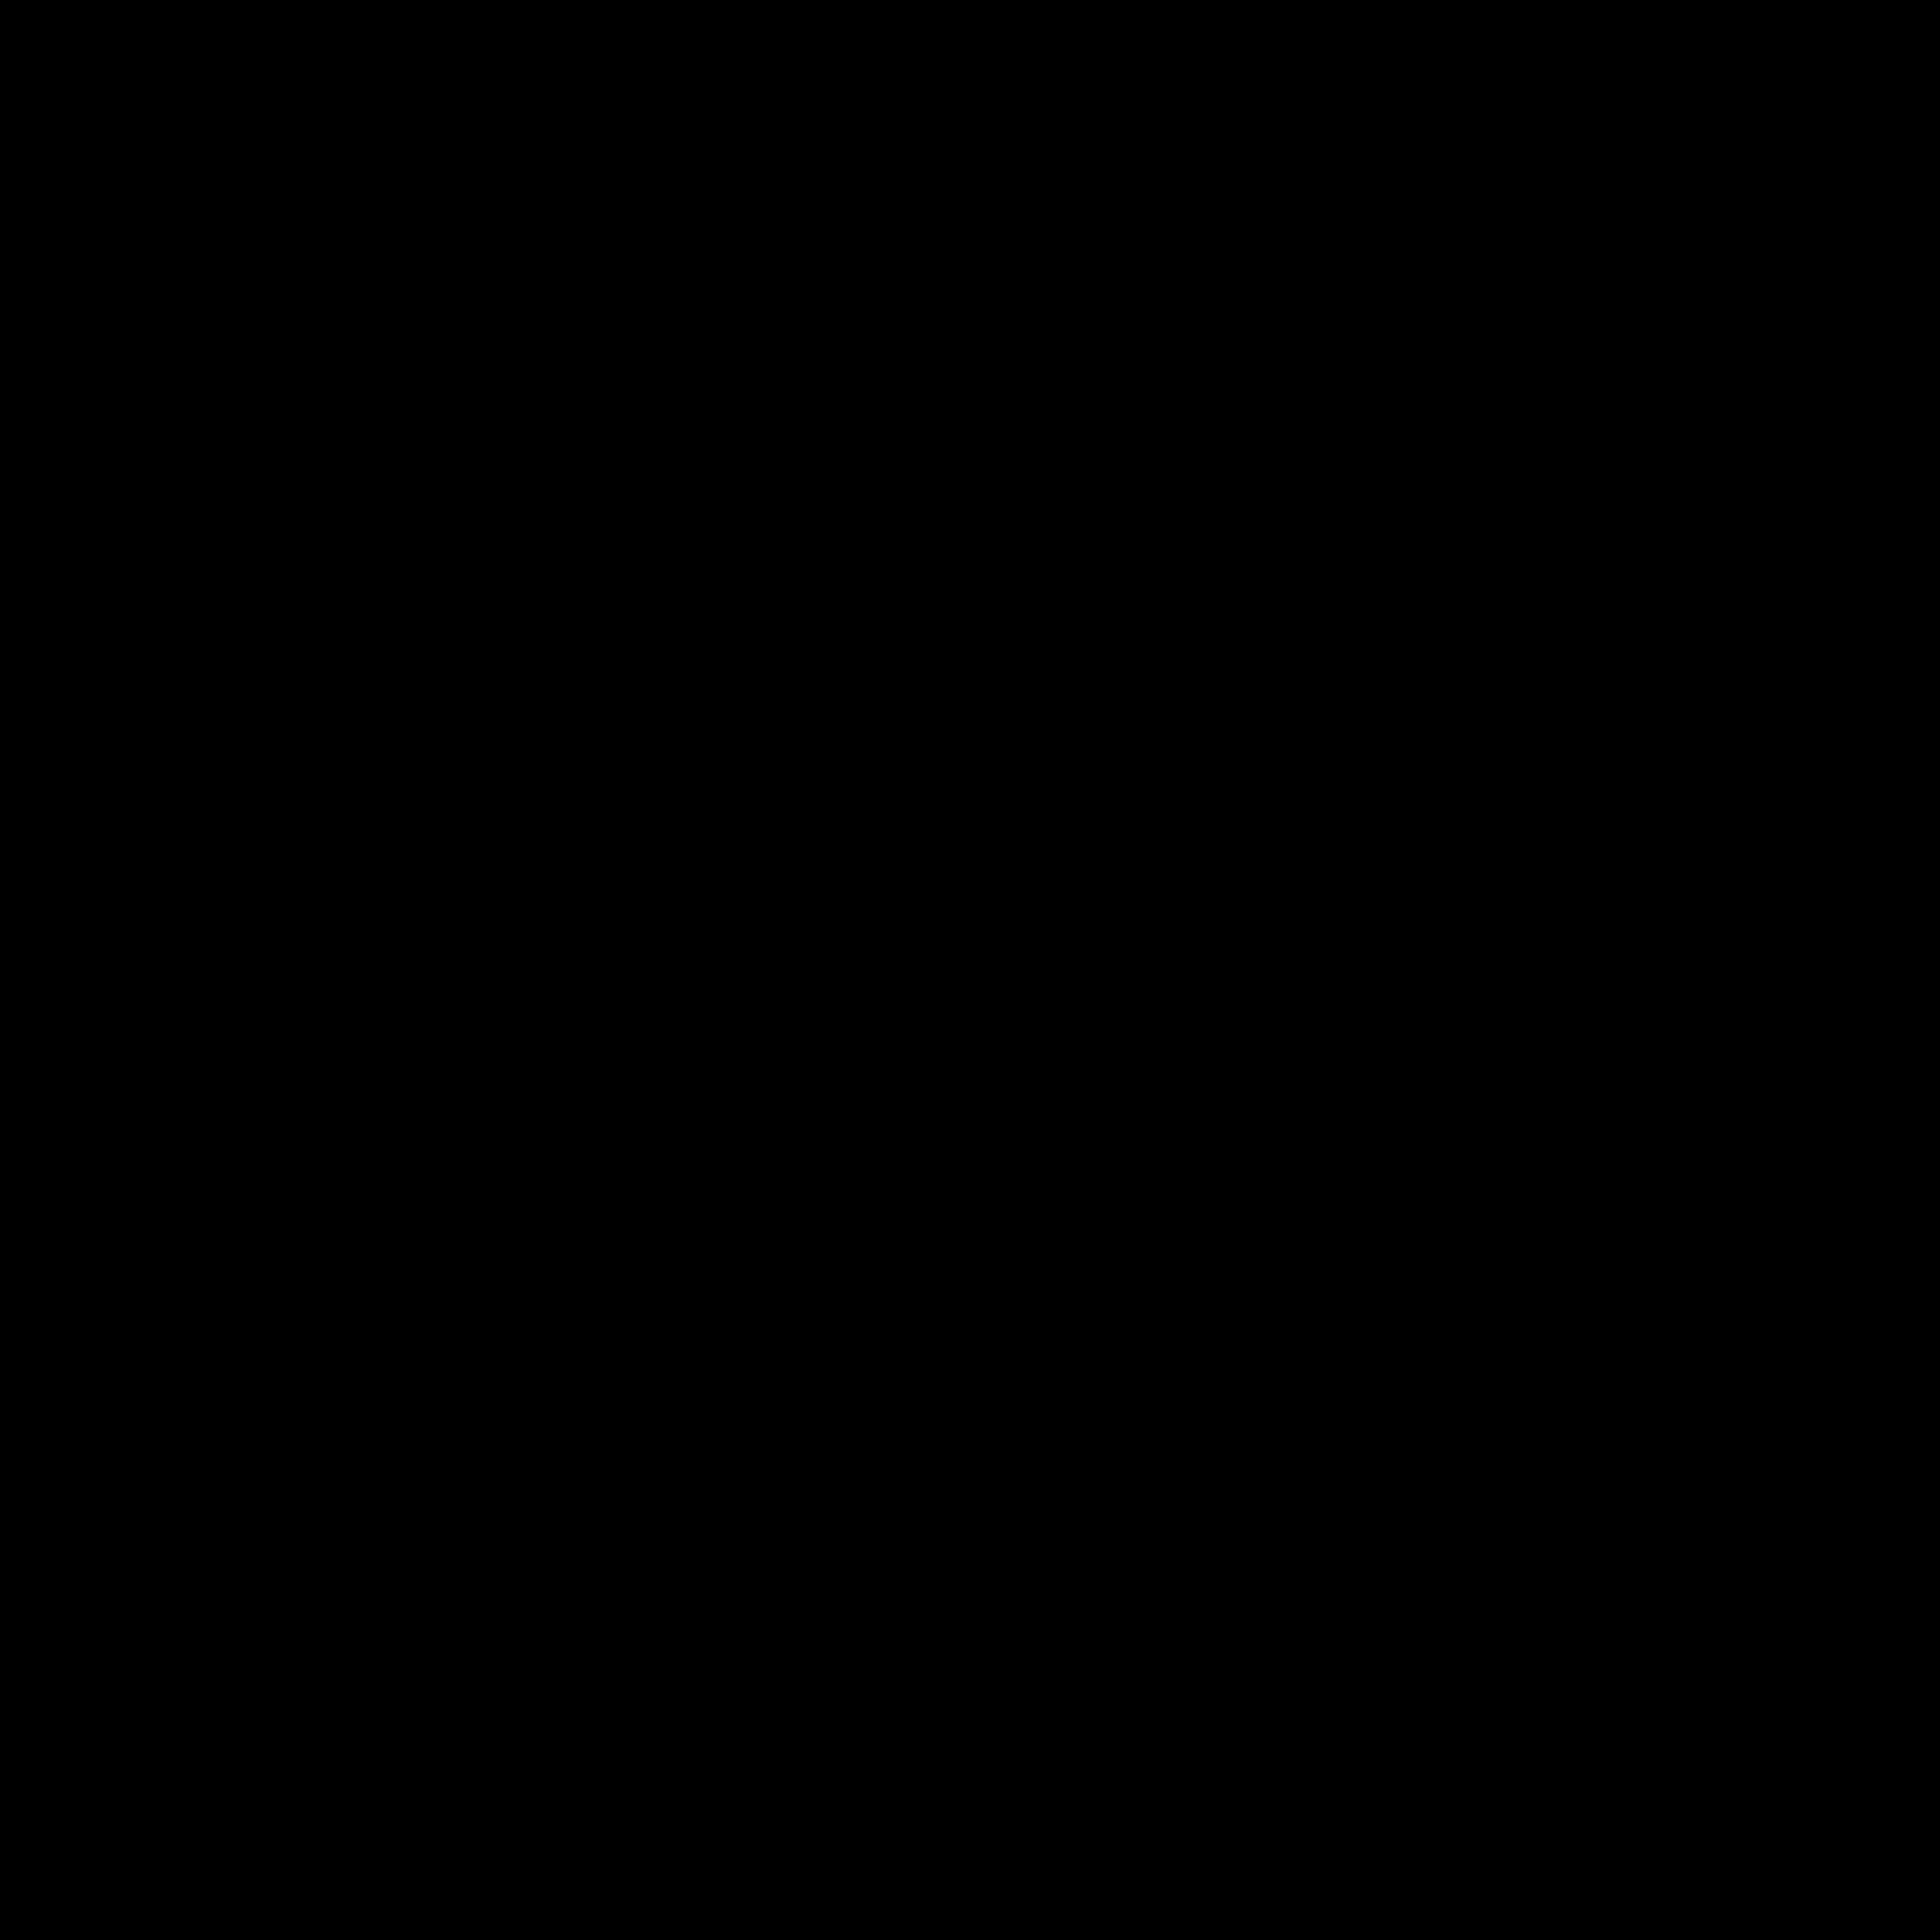 Net border big image. Frame clipart round